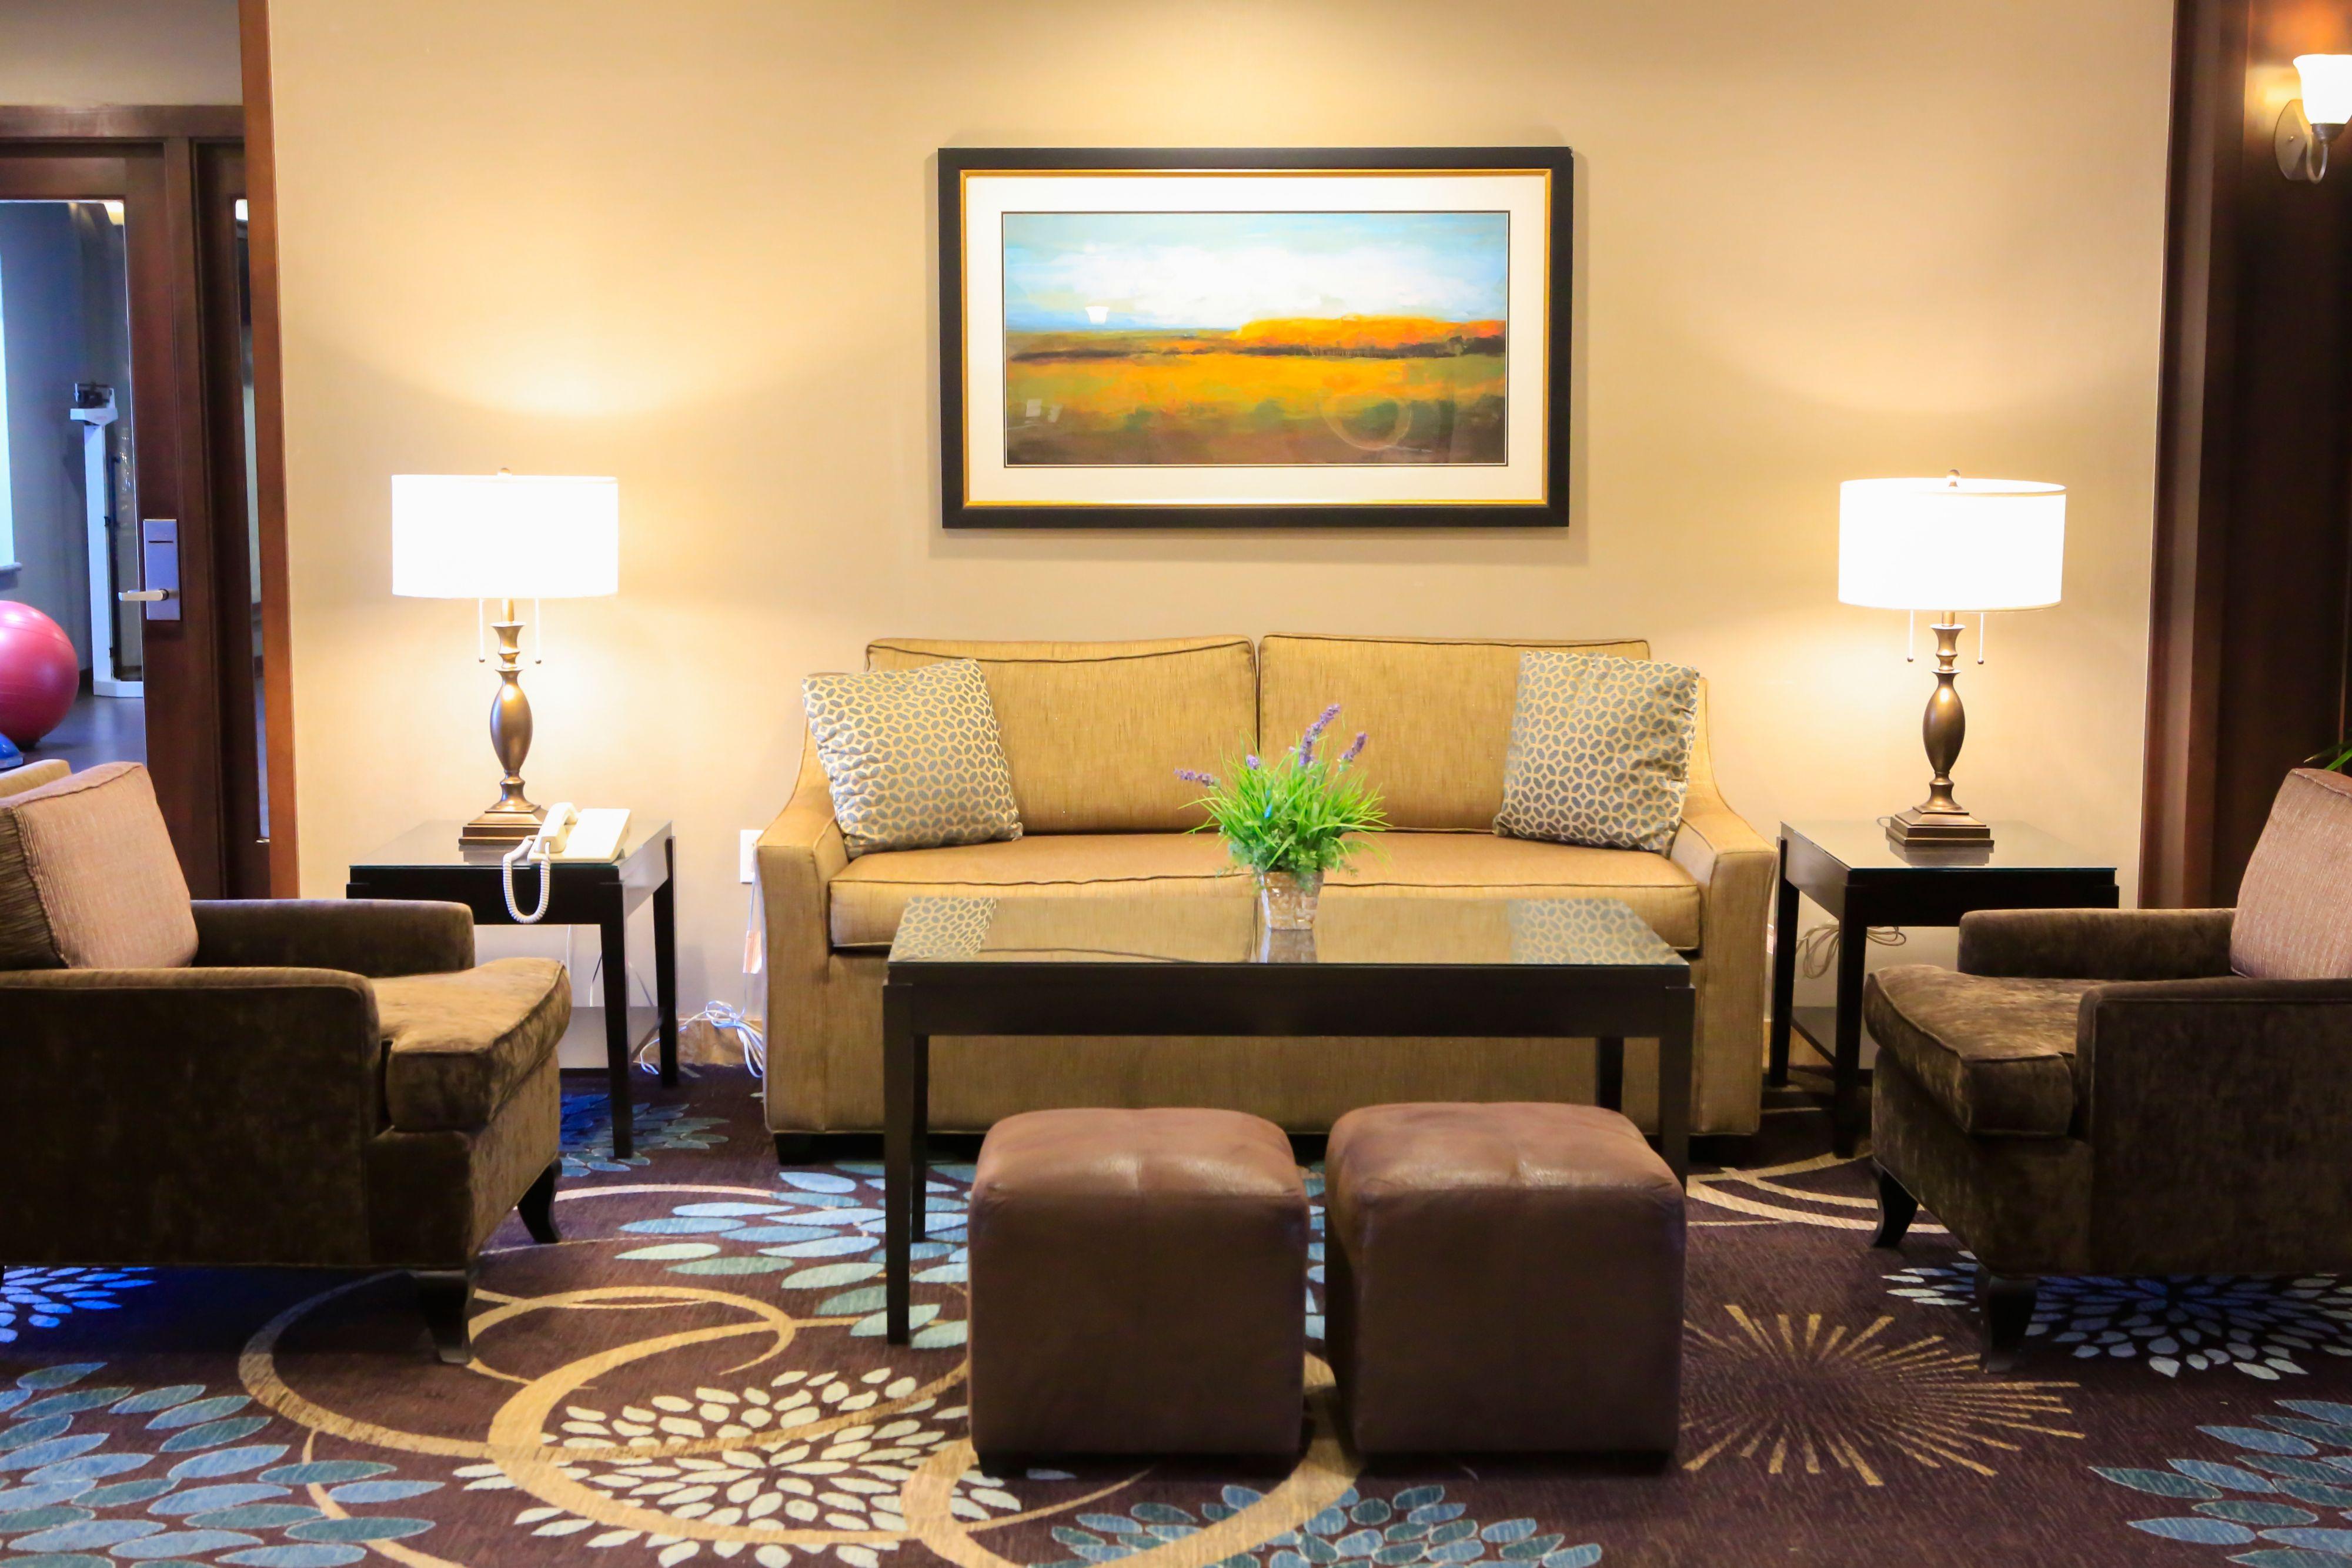 Staybridge Suites Silicon Valley-Milpitas image 9